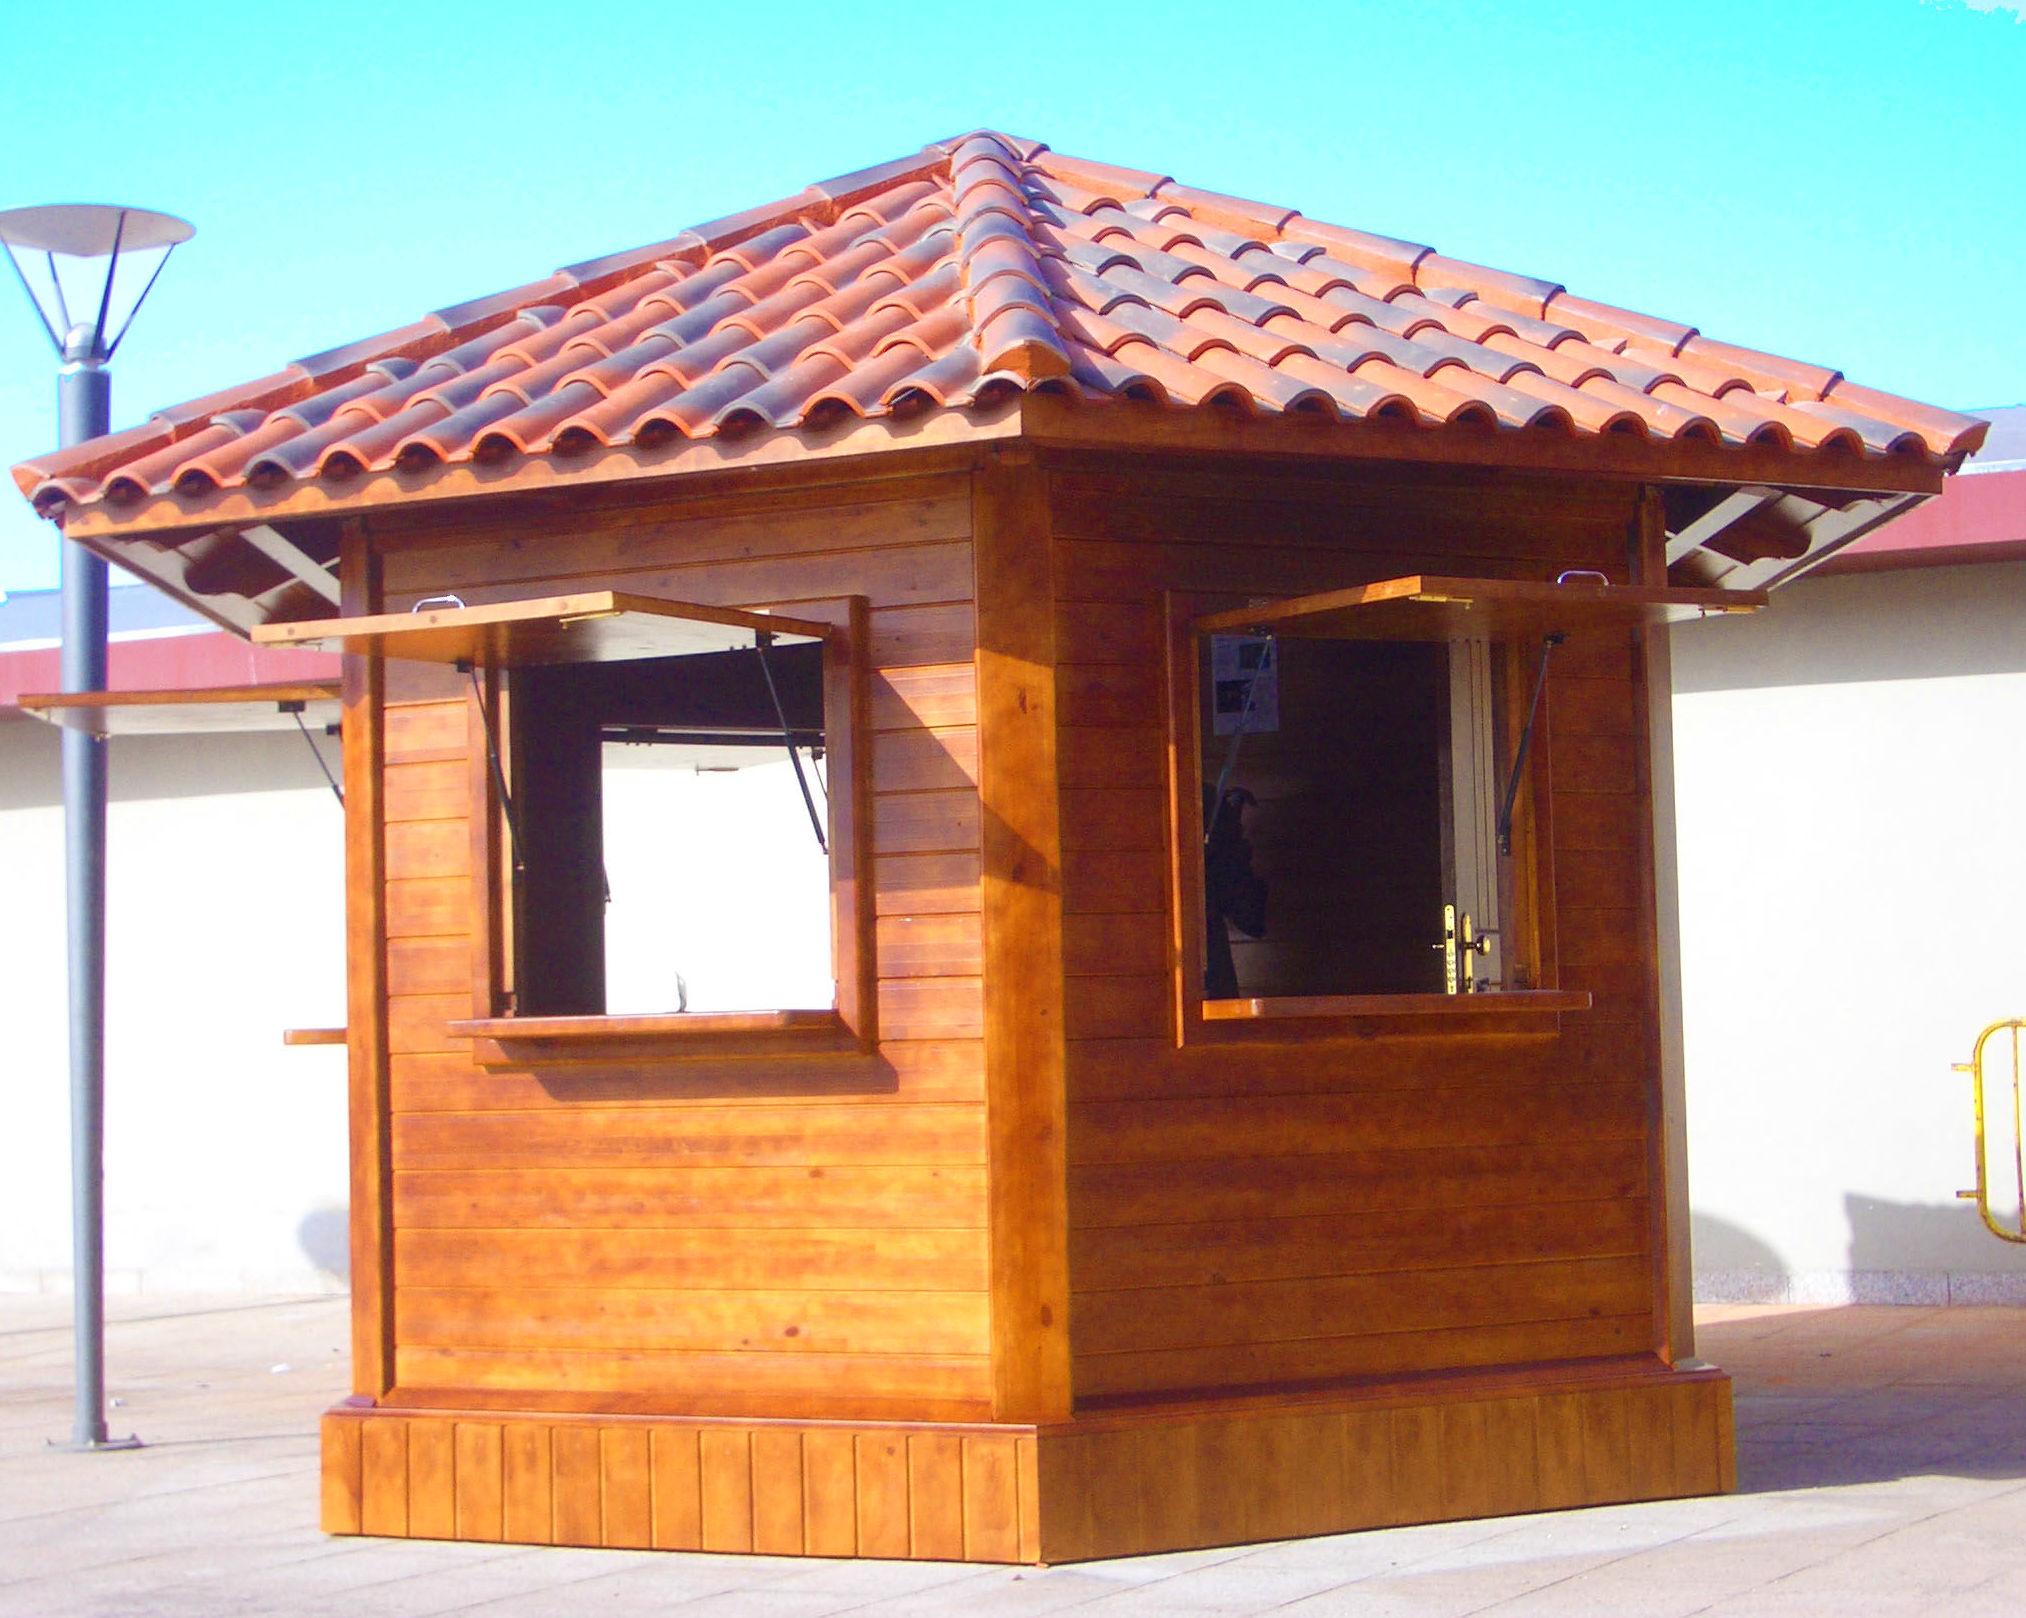 Caba as jard n garajes kioskos y casitas ni os for Fotos de kioscos de madera